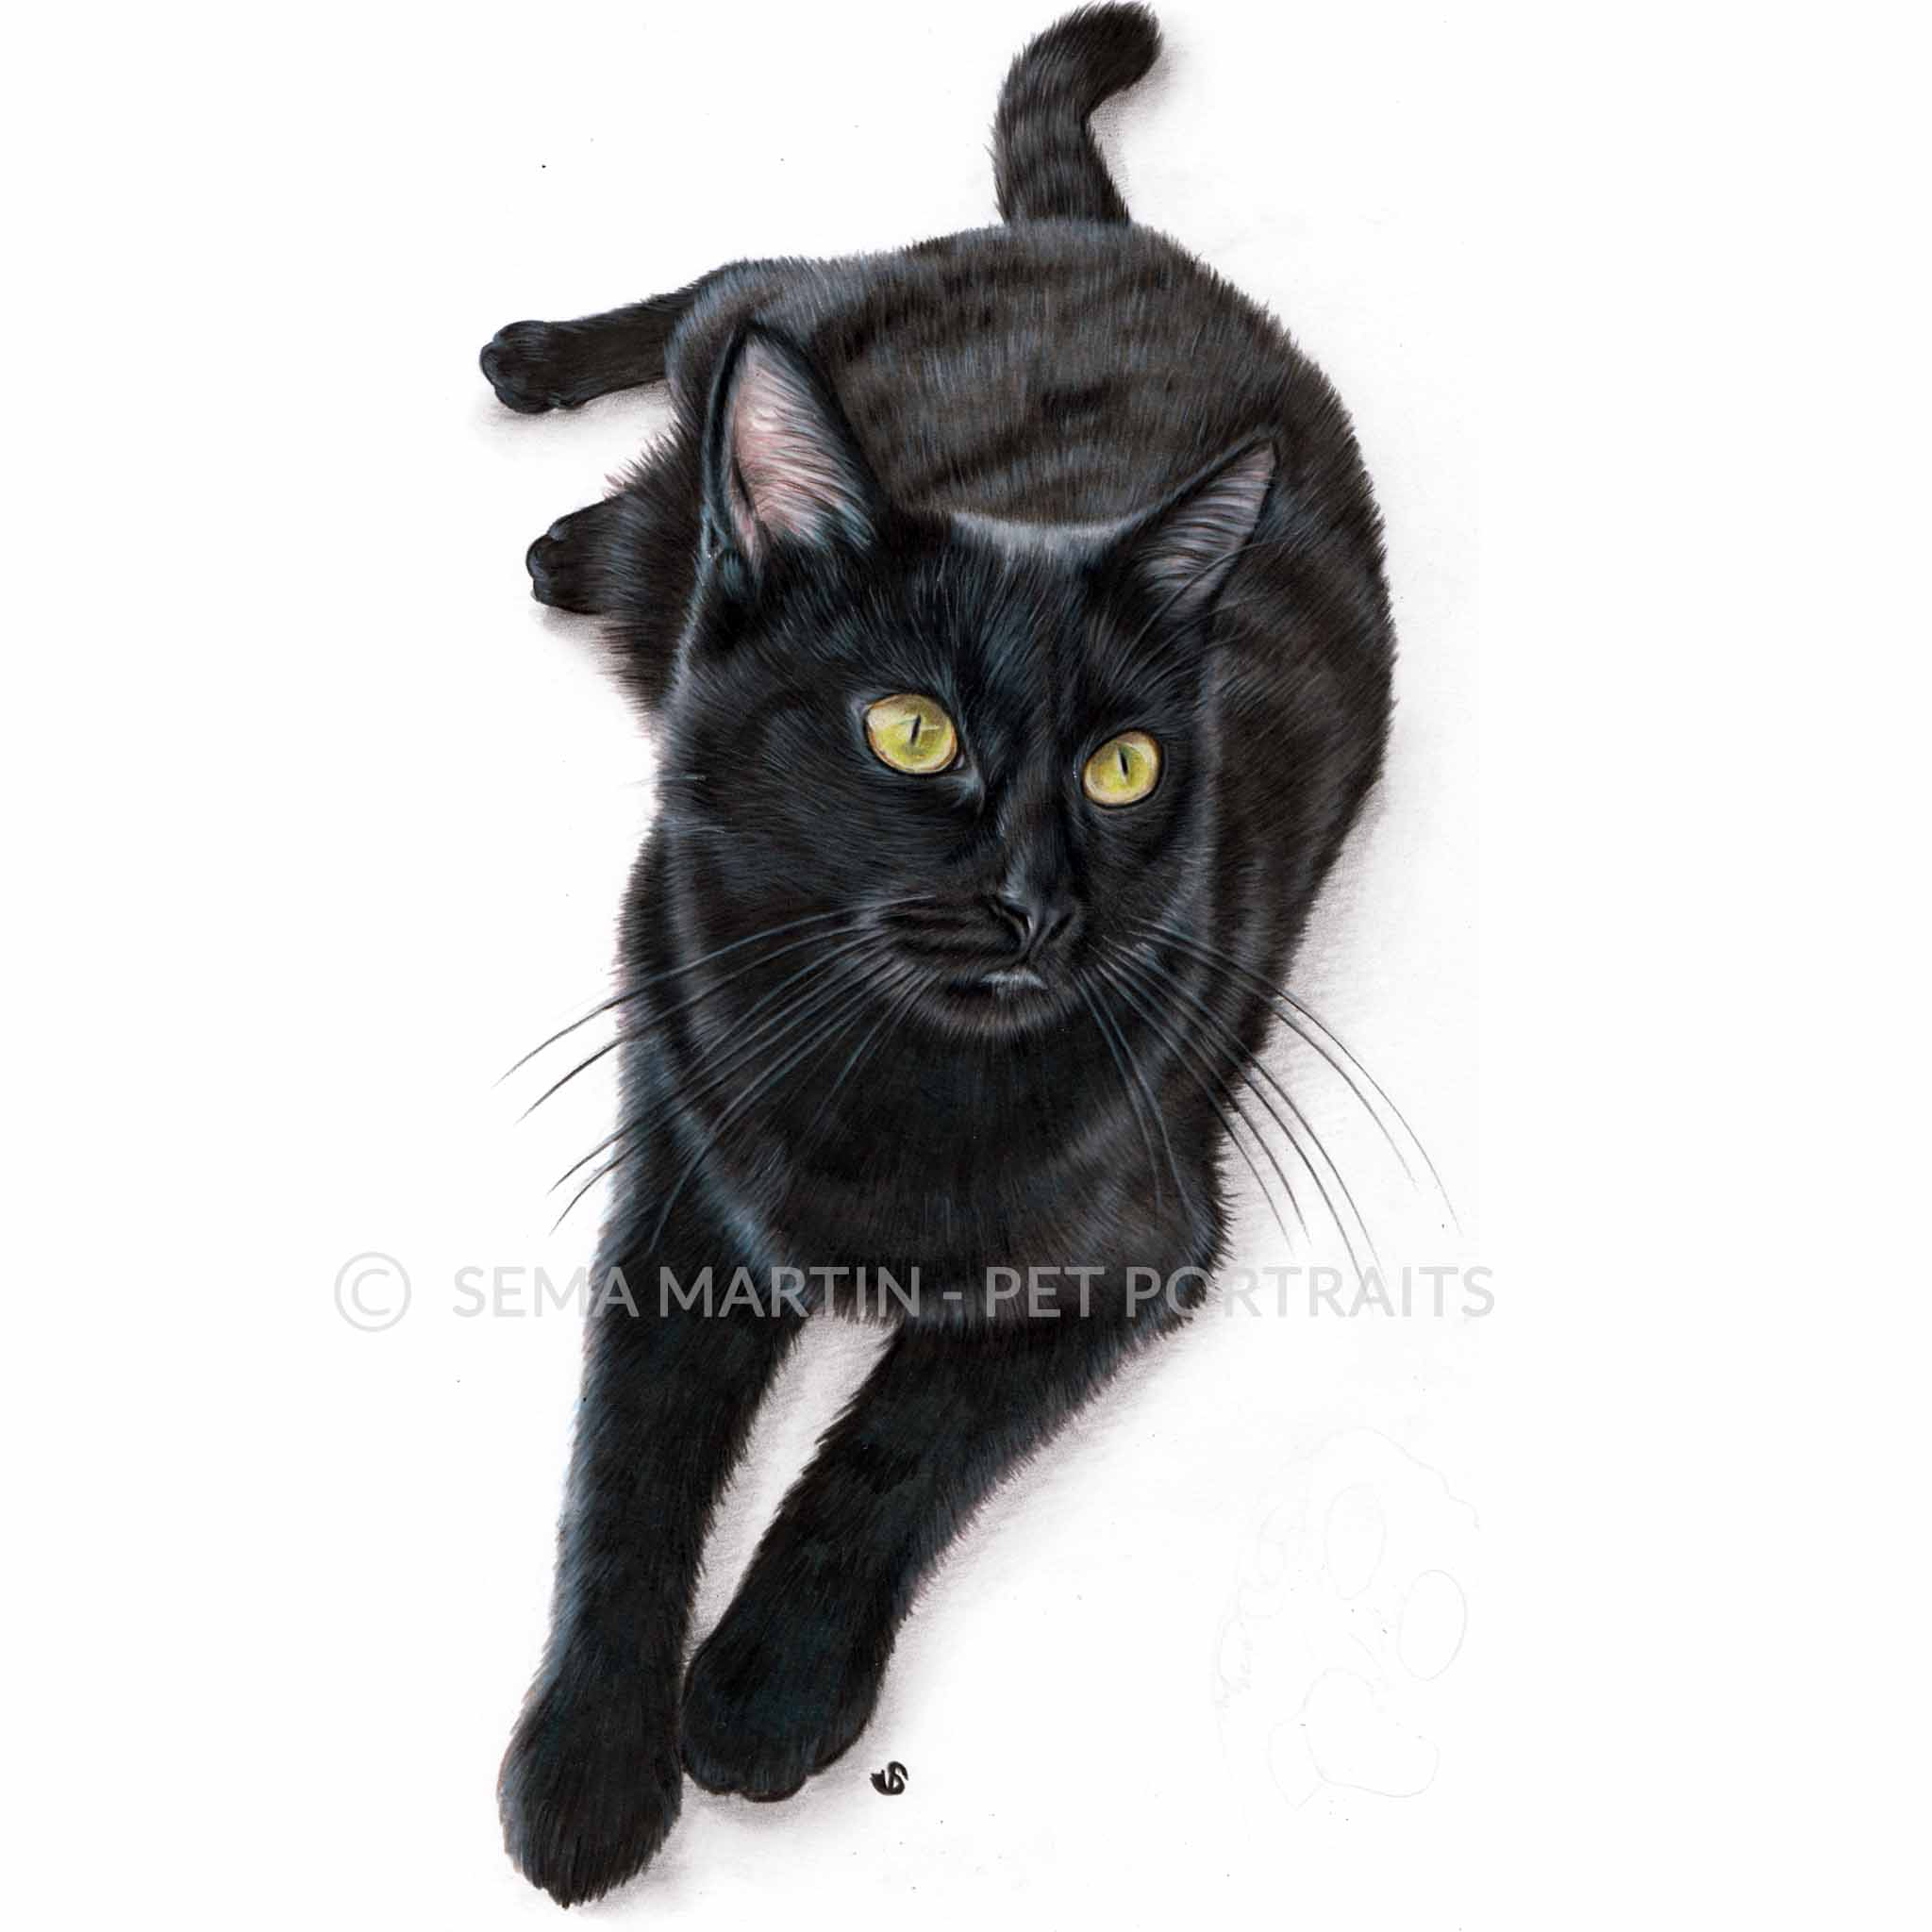 'Elsa' - UK, 8.3 x 11.7 inches, 2018, Colour Pencil Cat Portrait by Sema Martin